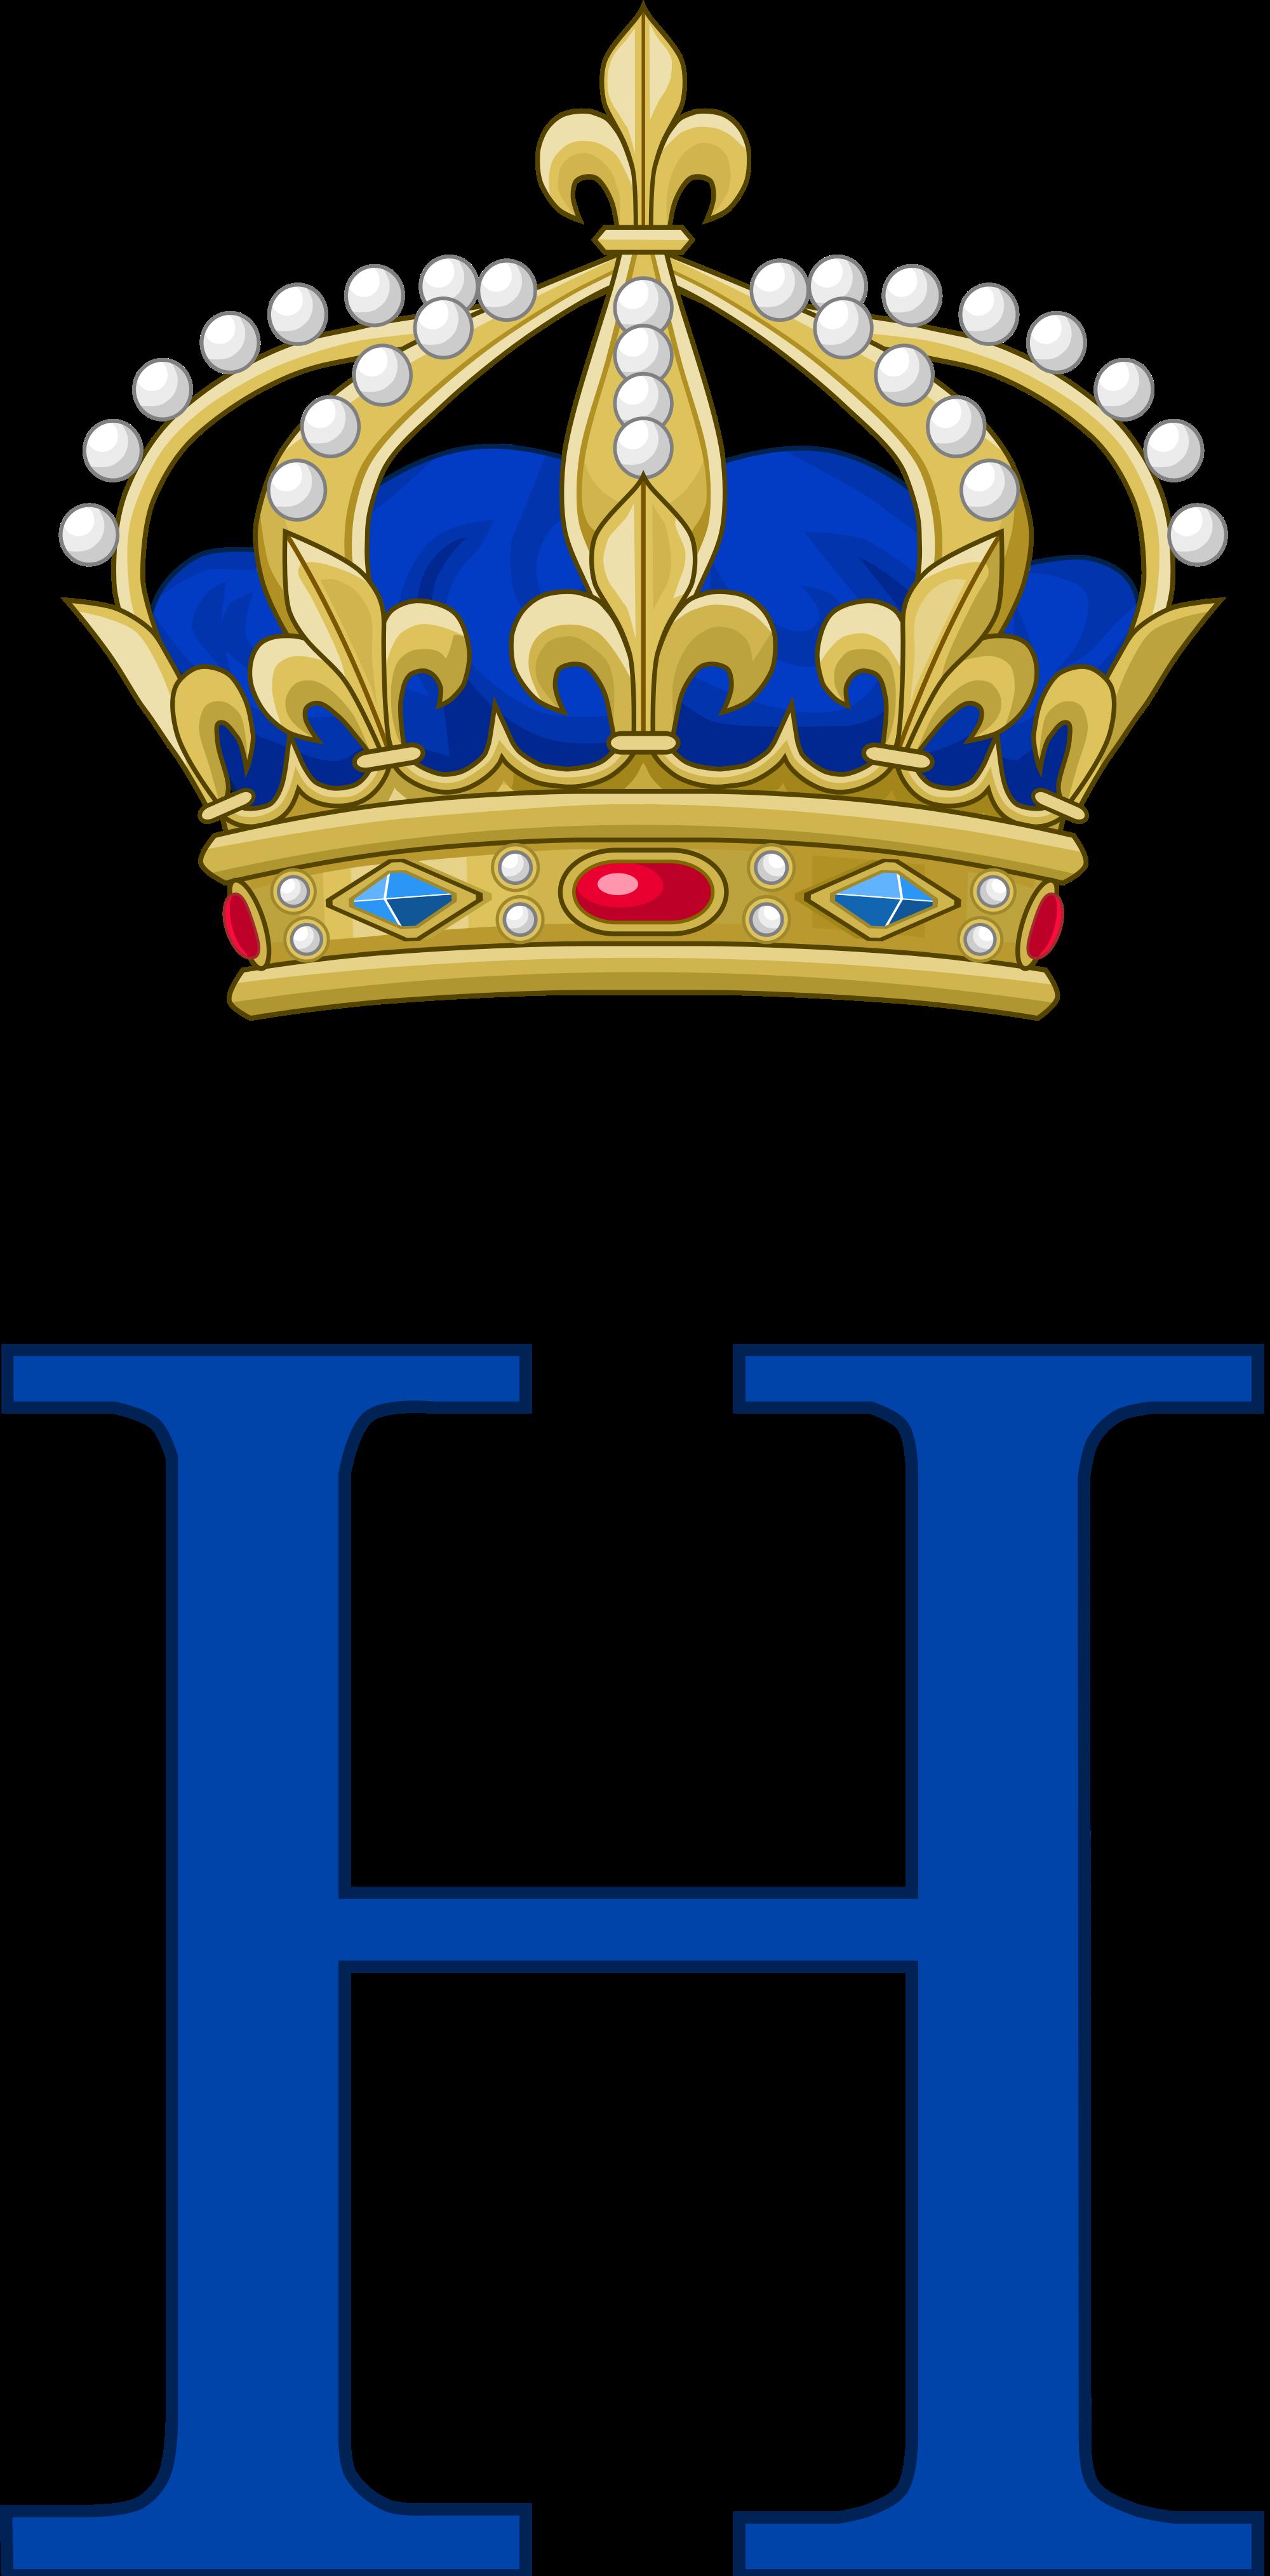 Countess crown clipart svg freeuse download King Henri III of France | Royal Monograms | Pinterest | Royal house svg freeuse download